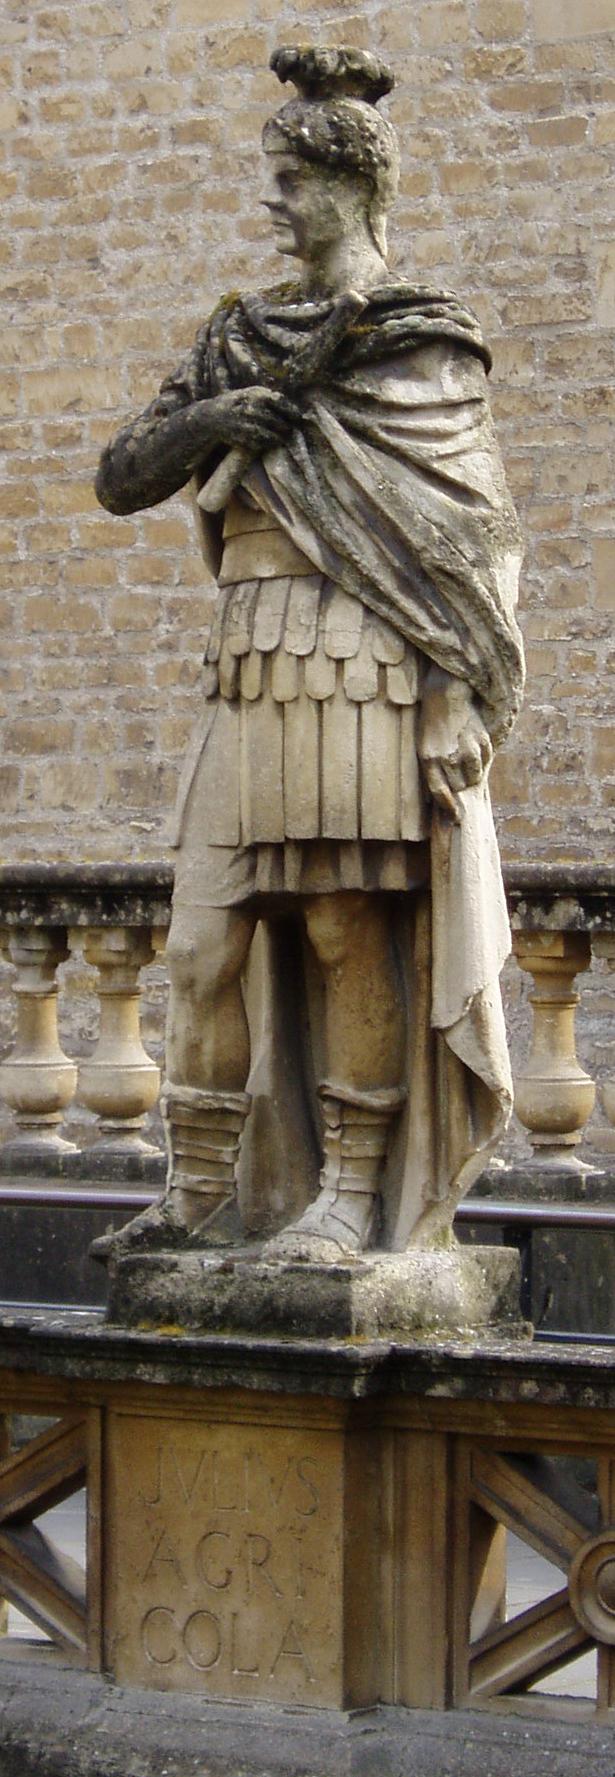 Statue_of_Agricola_at_Bath.jpg